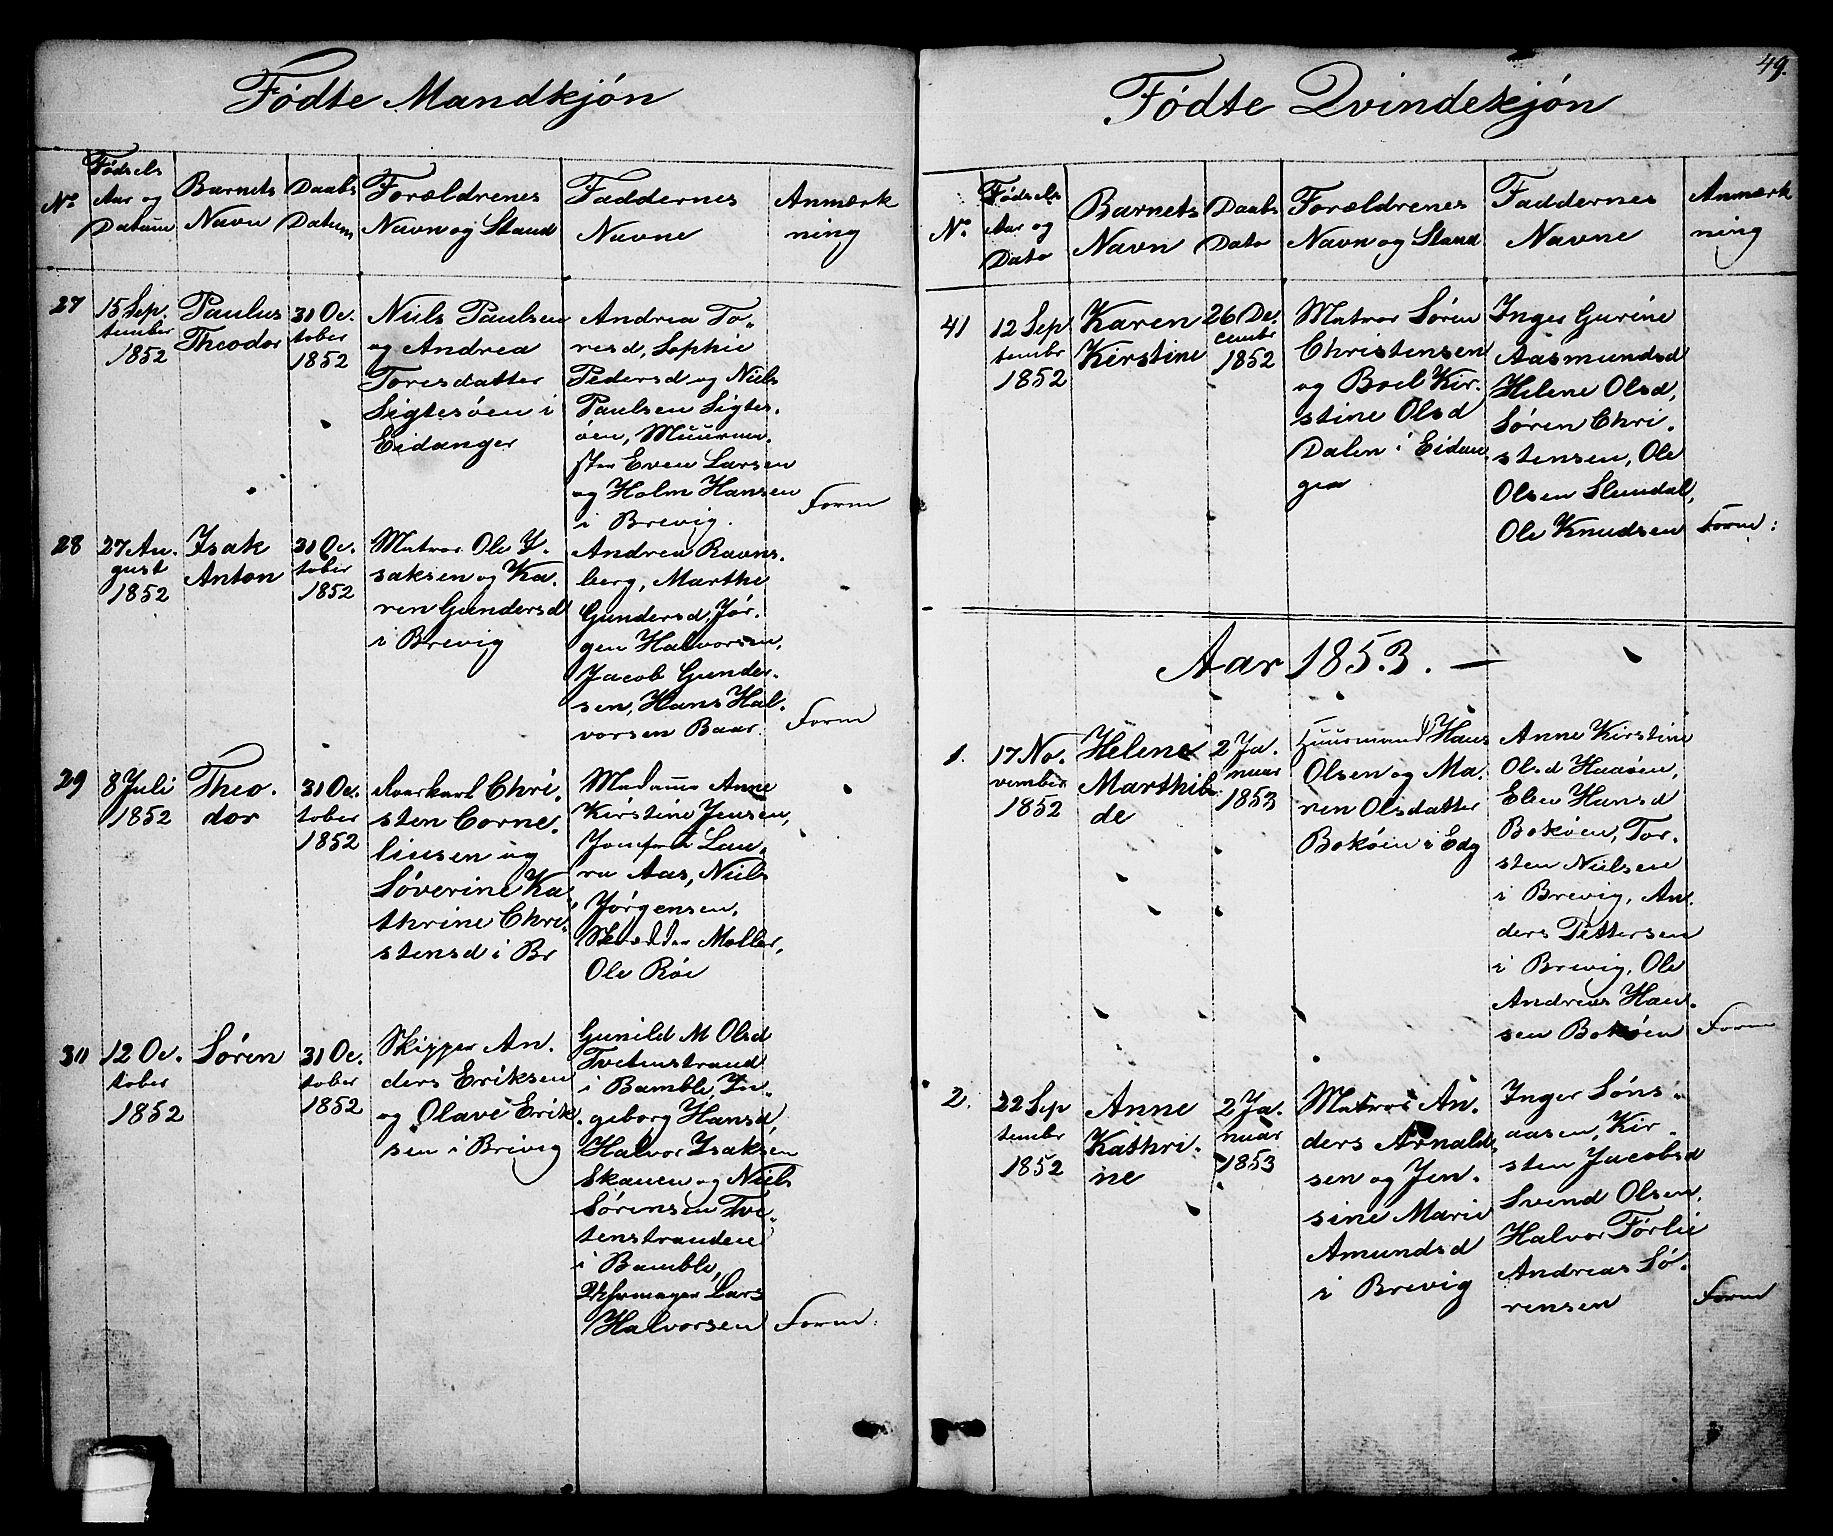 SAKO, Brevik kirkebøker, G/Ga/L0002: Klokkerbok nr. 2, 1846-1865, s. 49